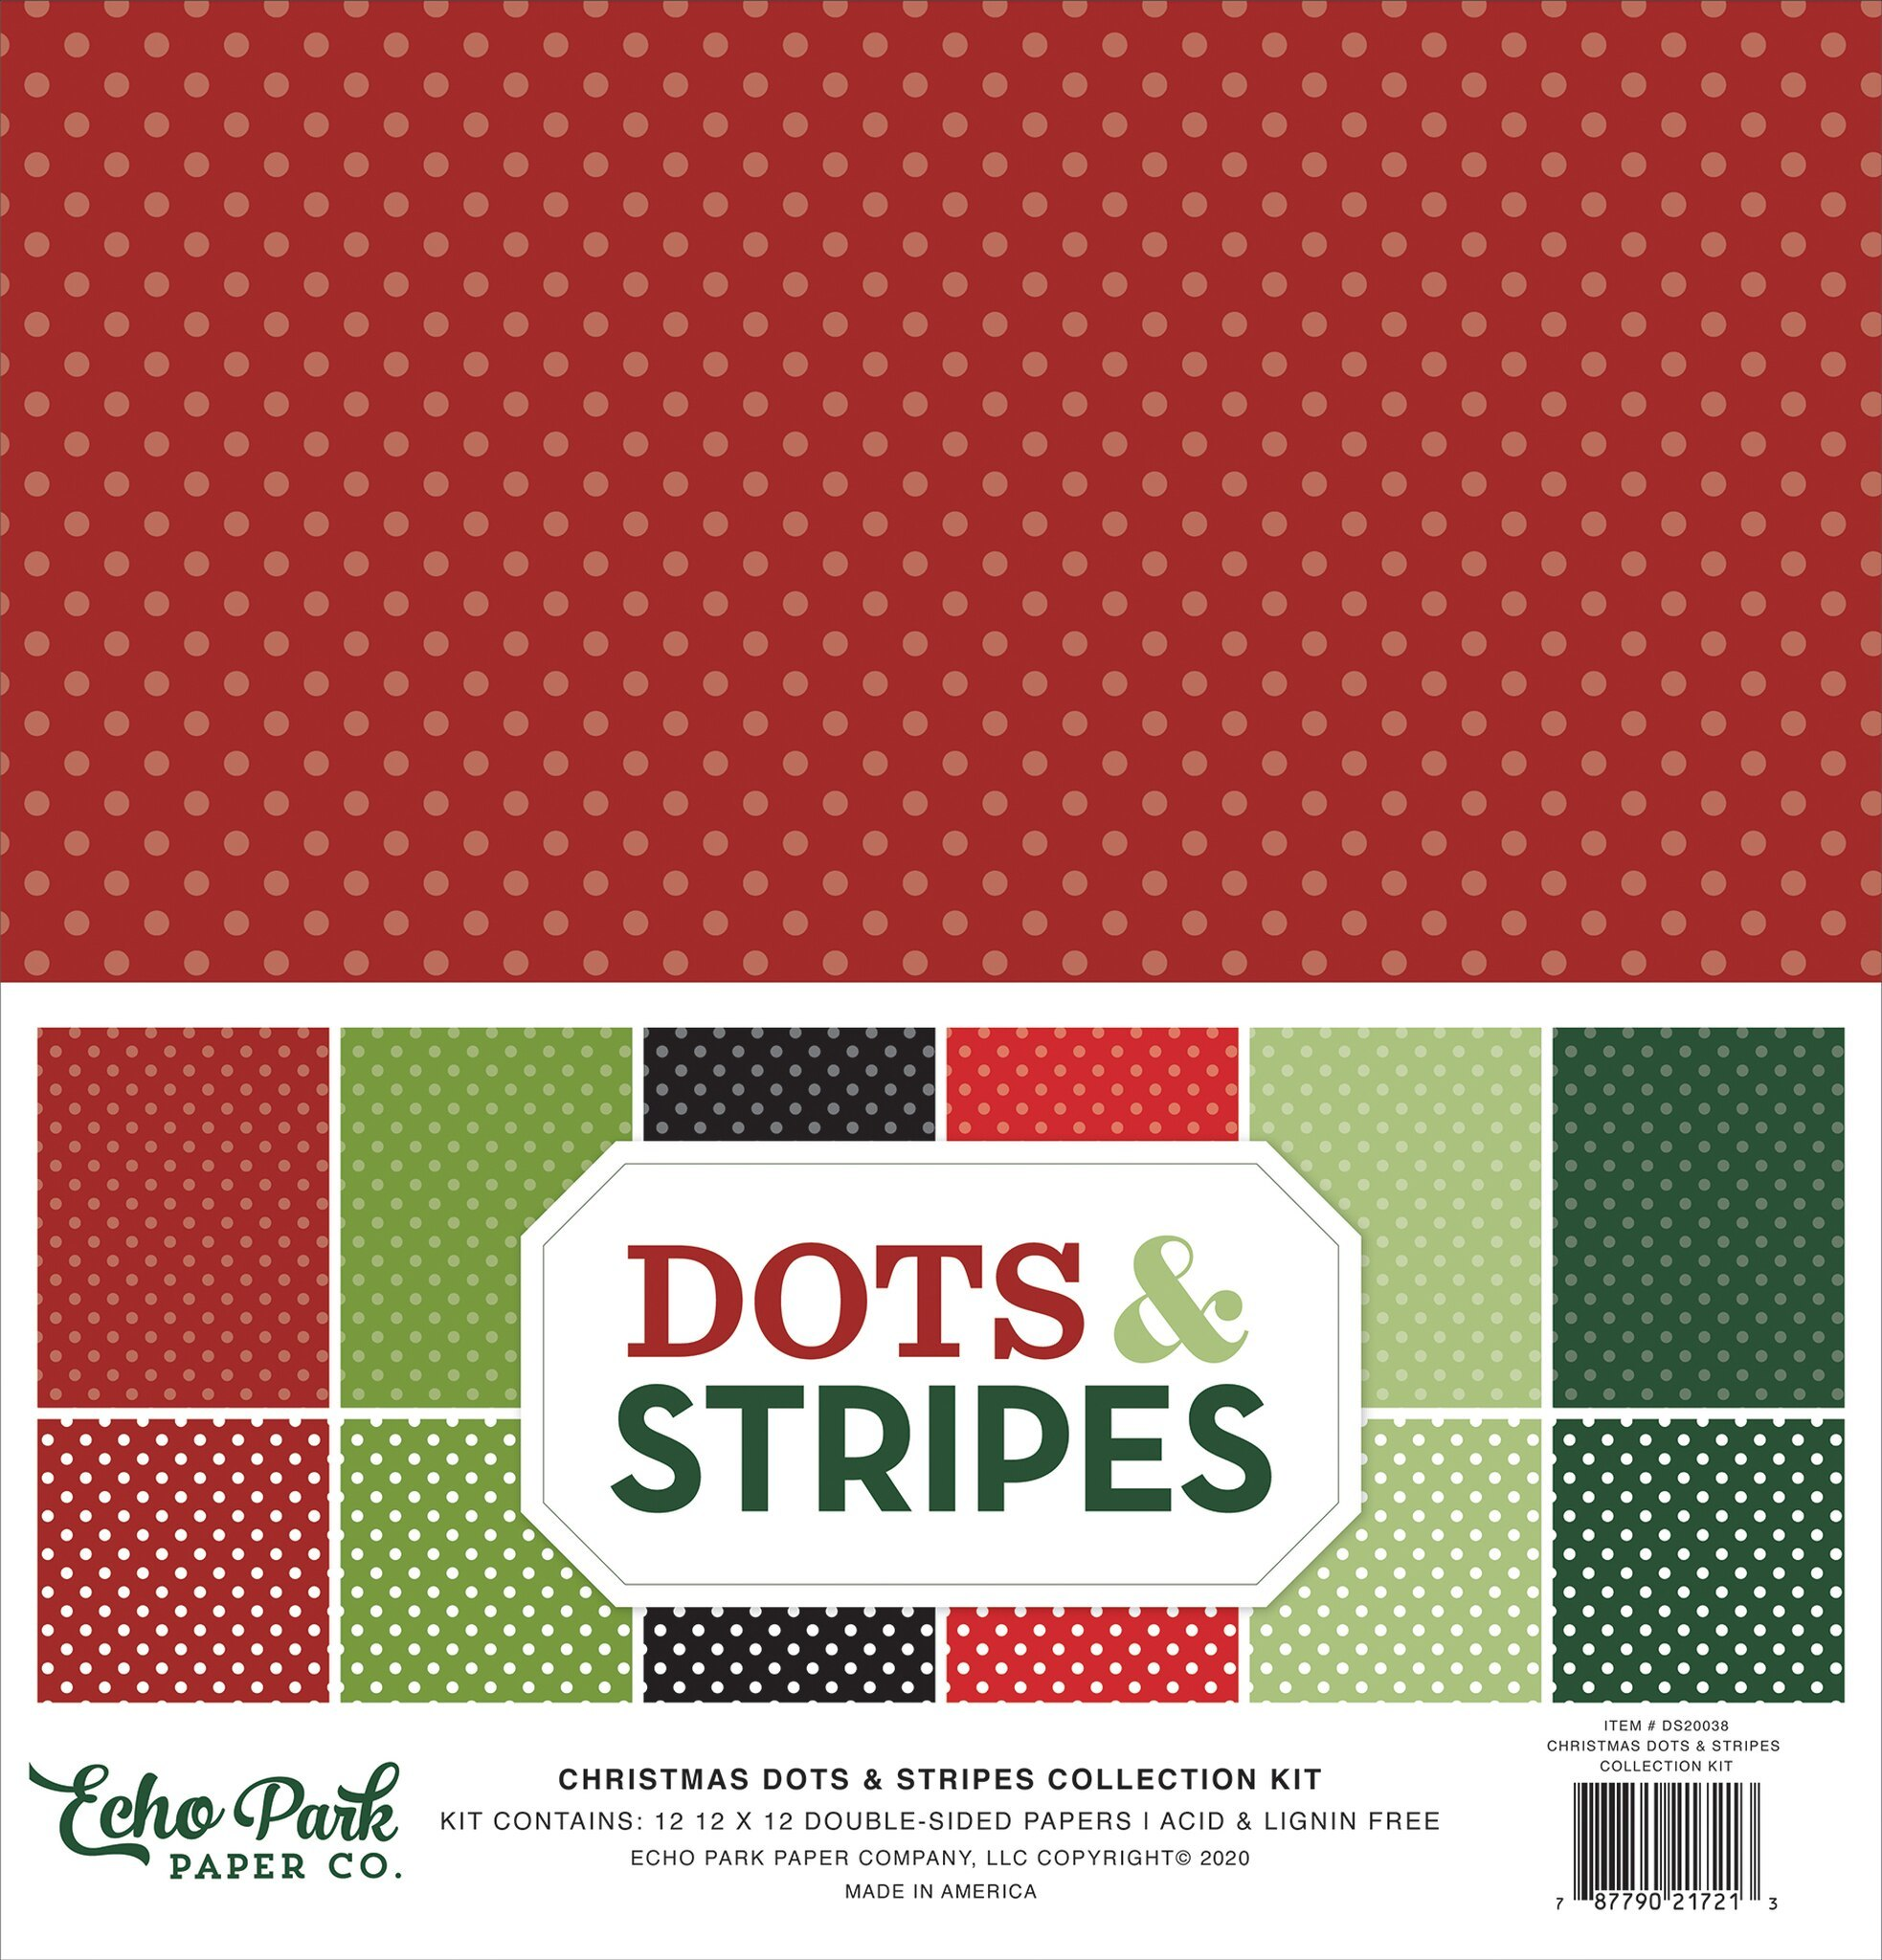 Christmas Dots & Stripes